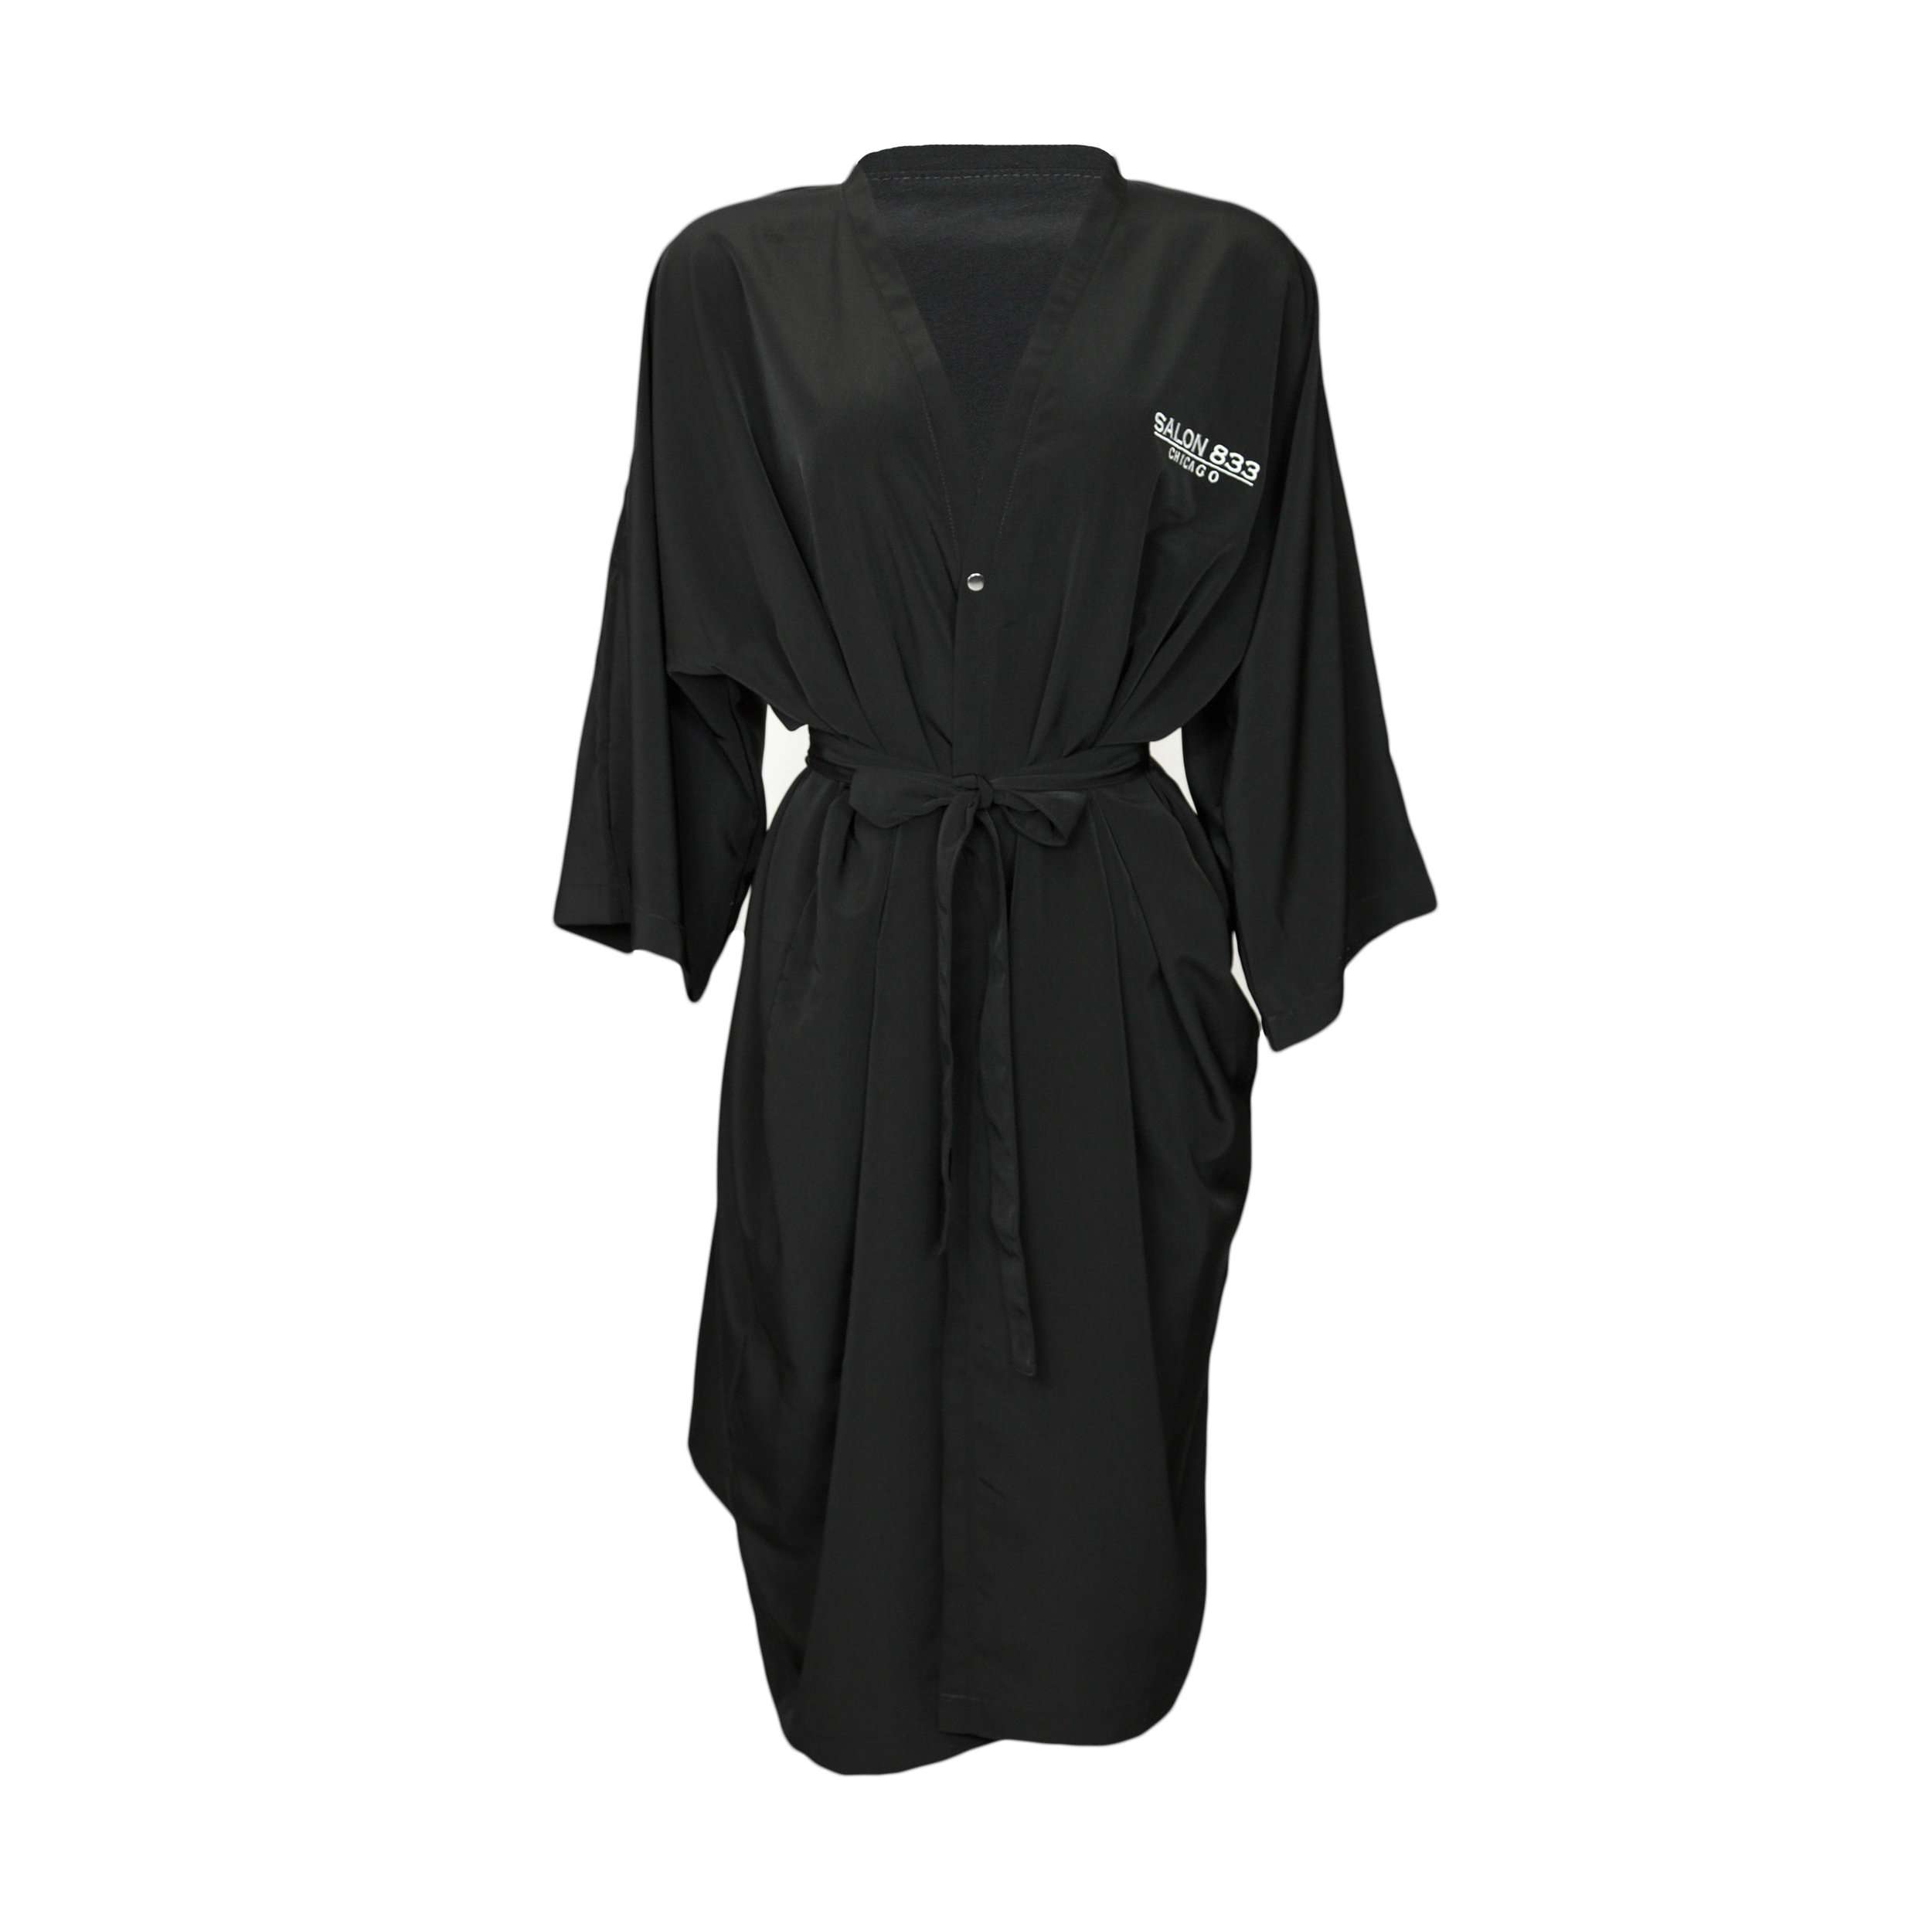 Salon833-Gown-Front.jpg